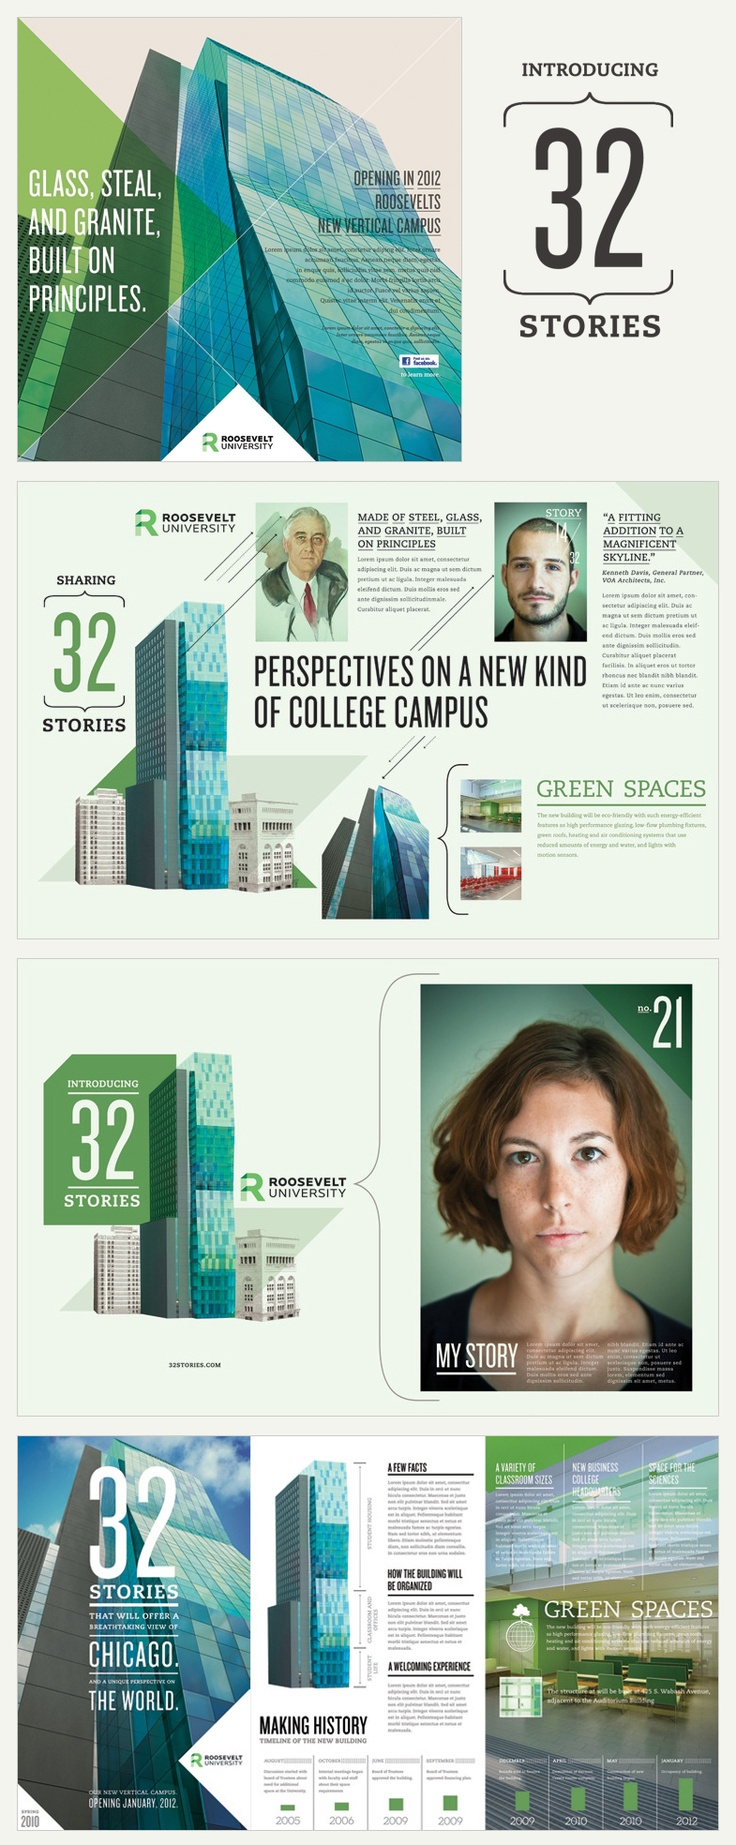 http://mikemcquade.com/Roosevelt-University #layout